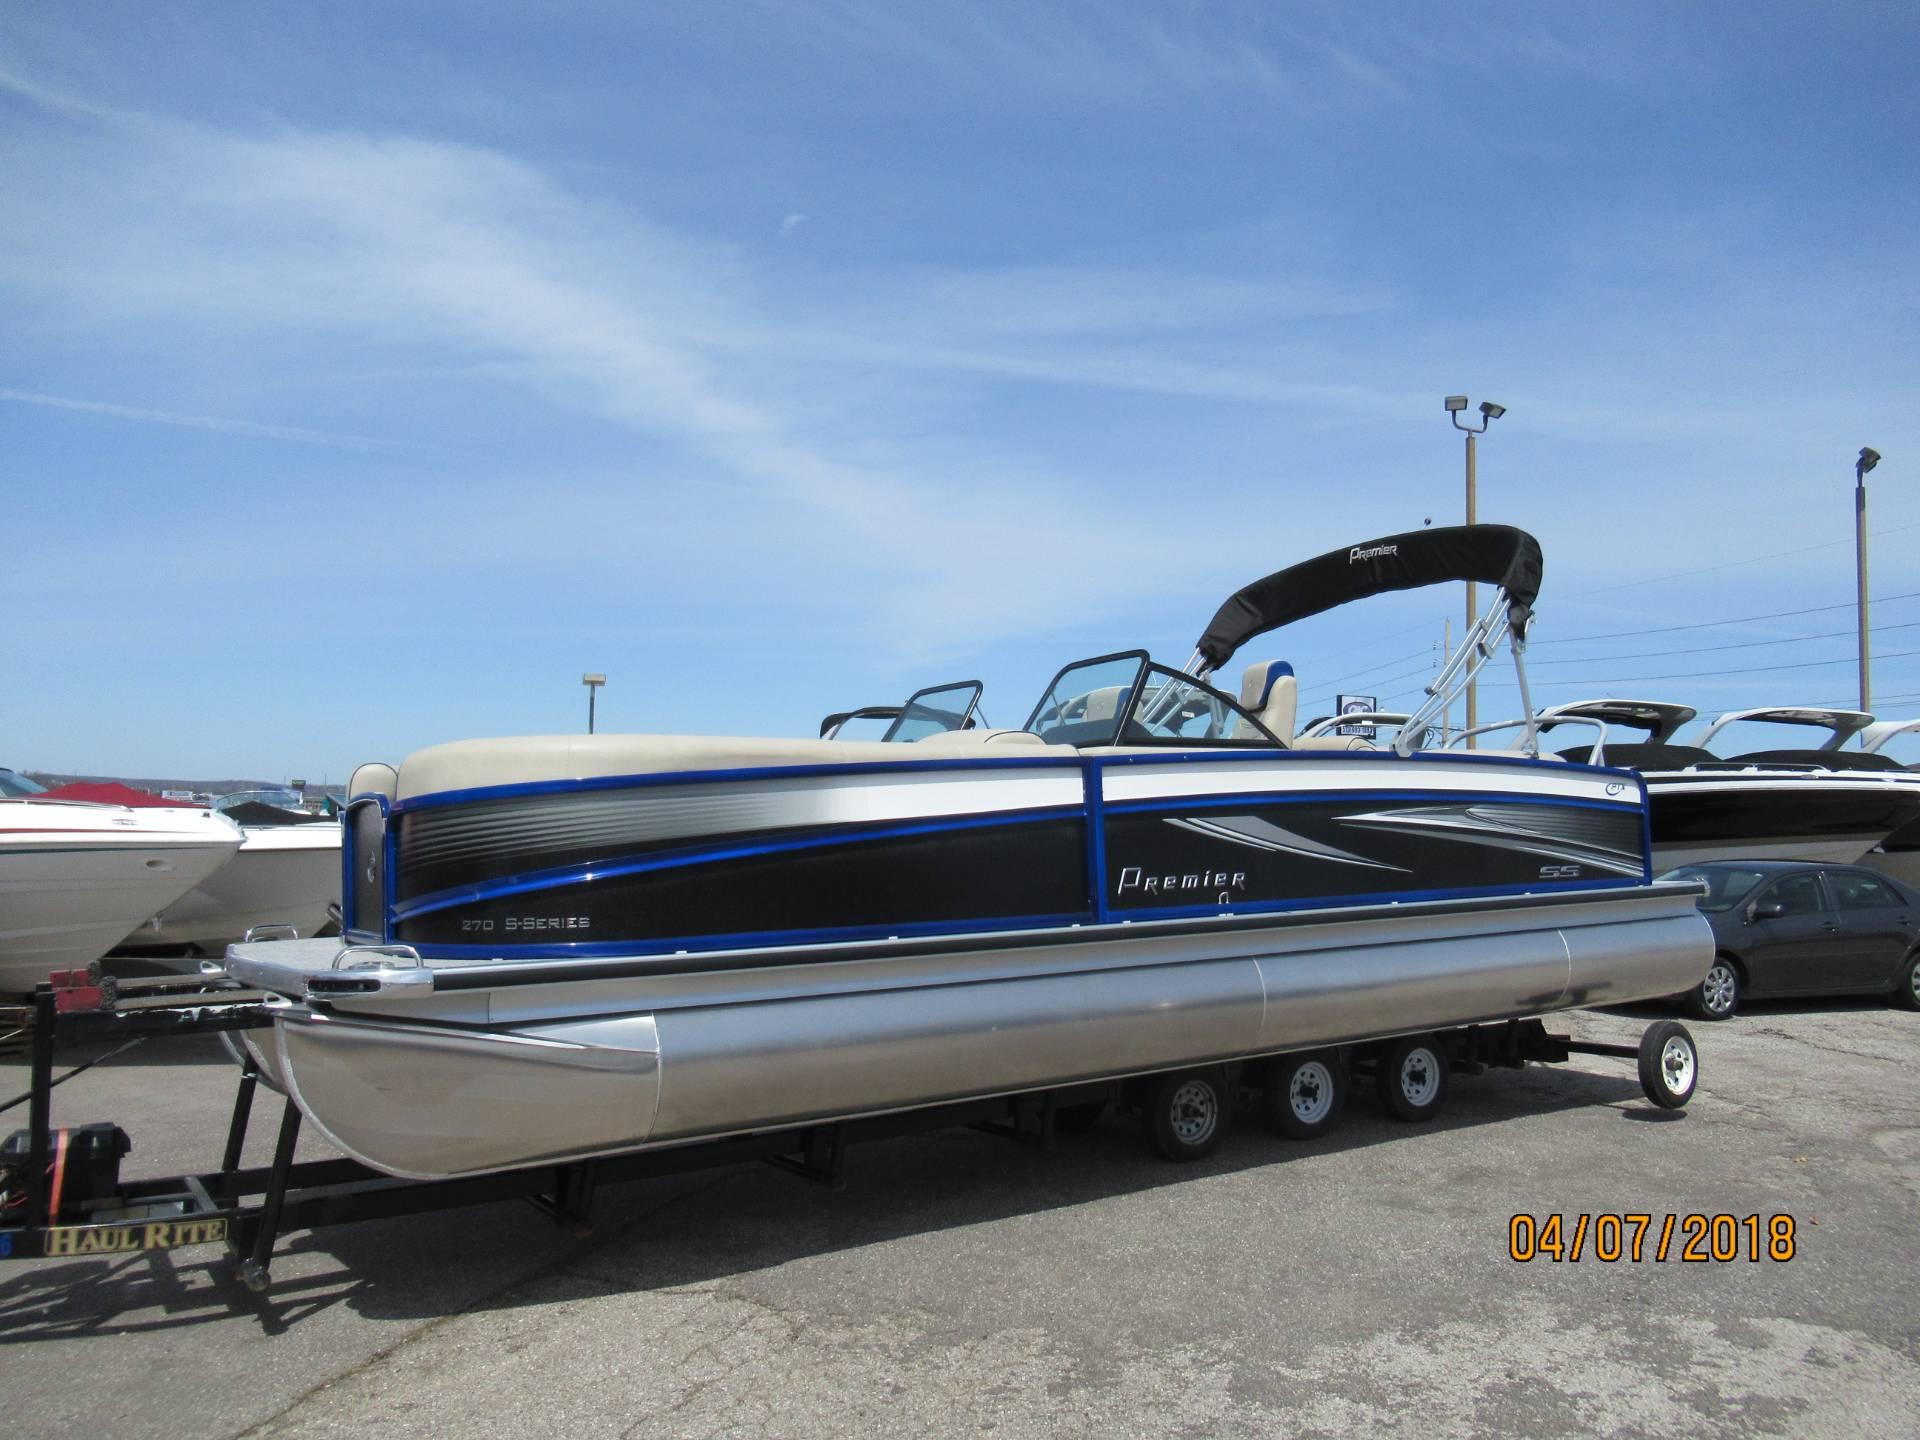 Premier 270 S-Series